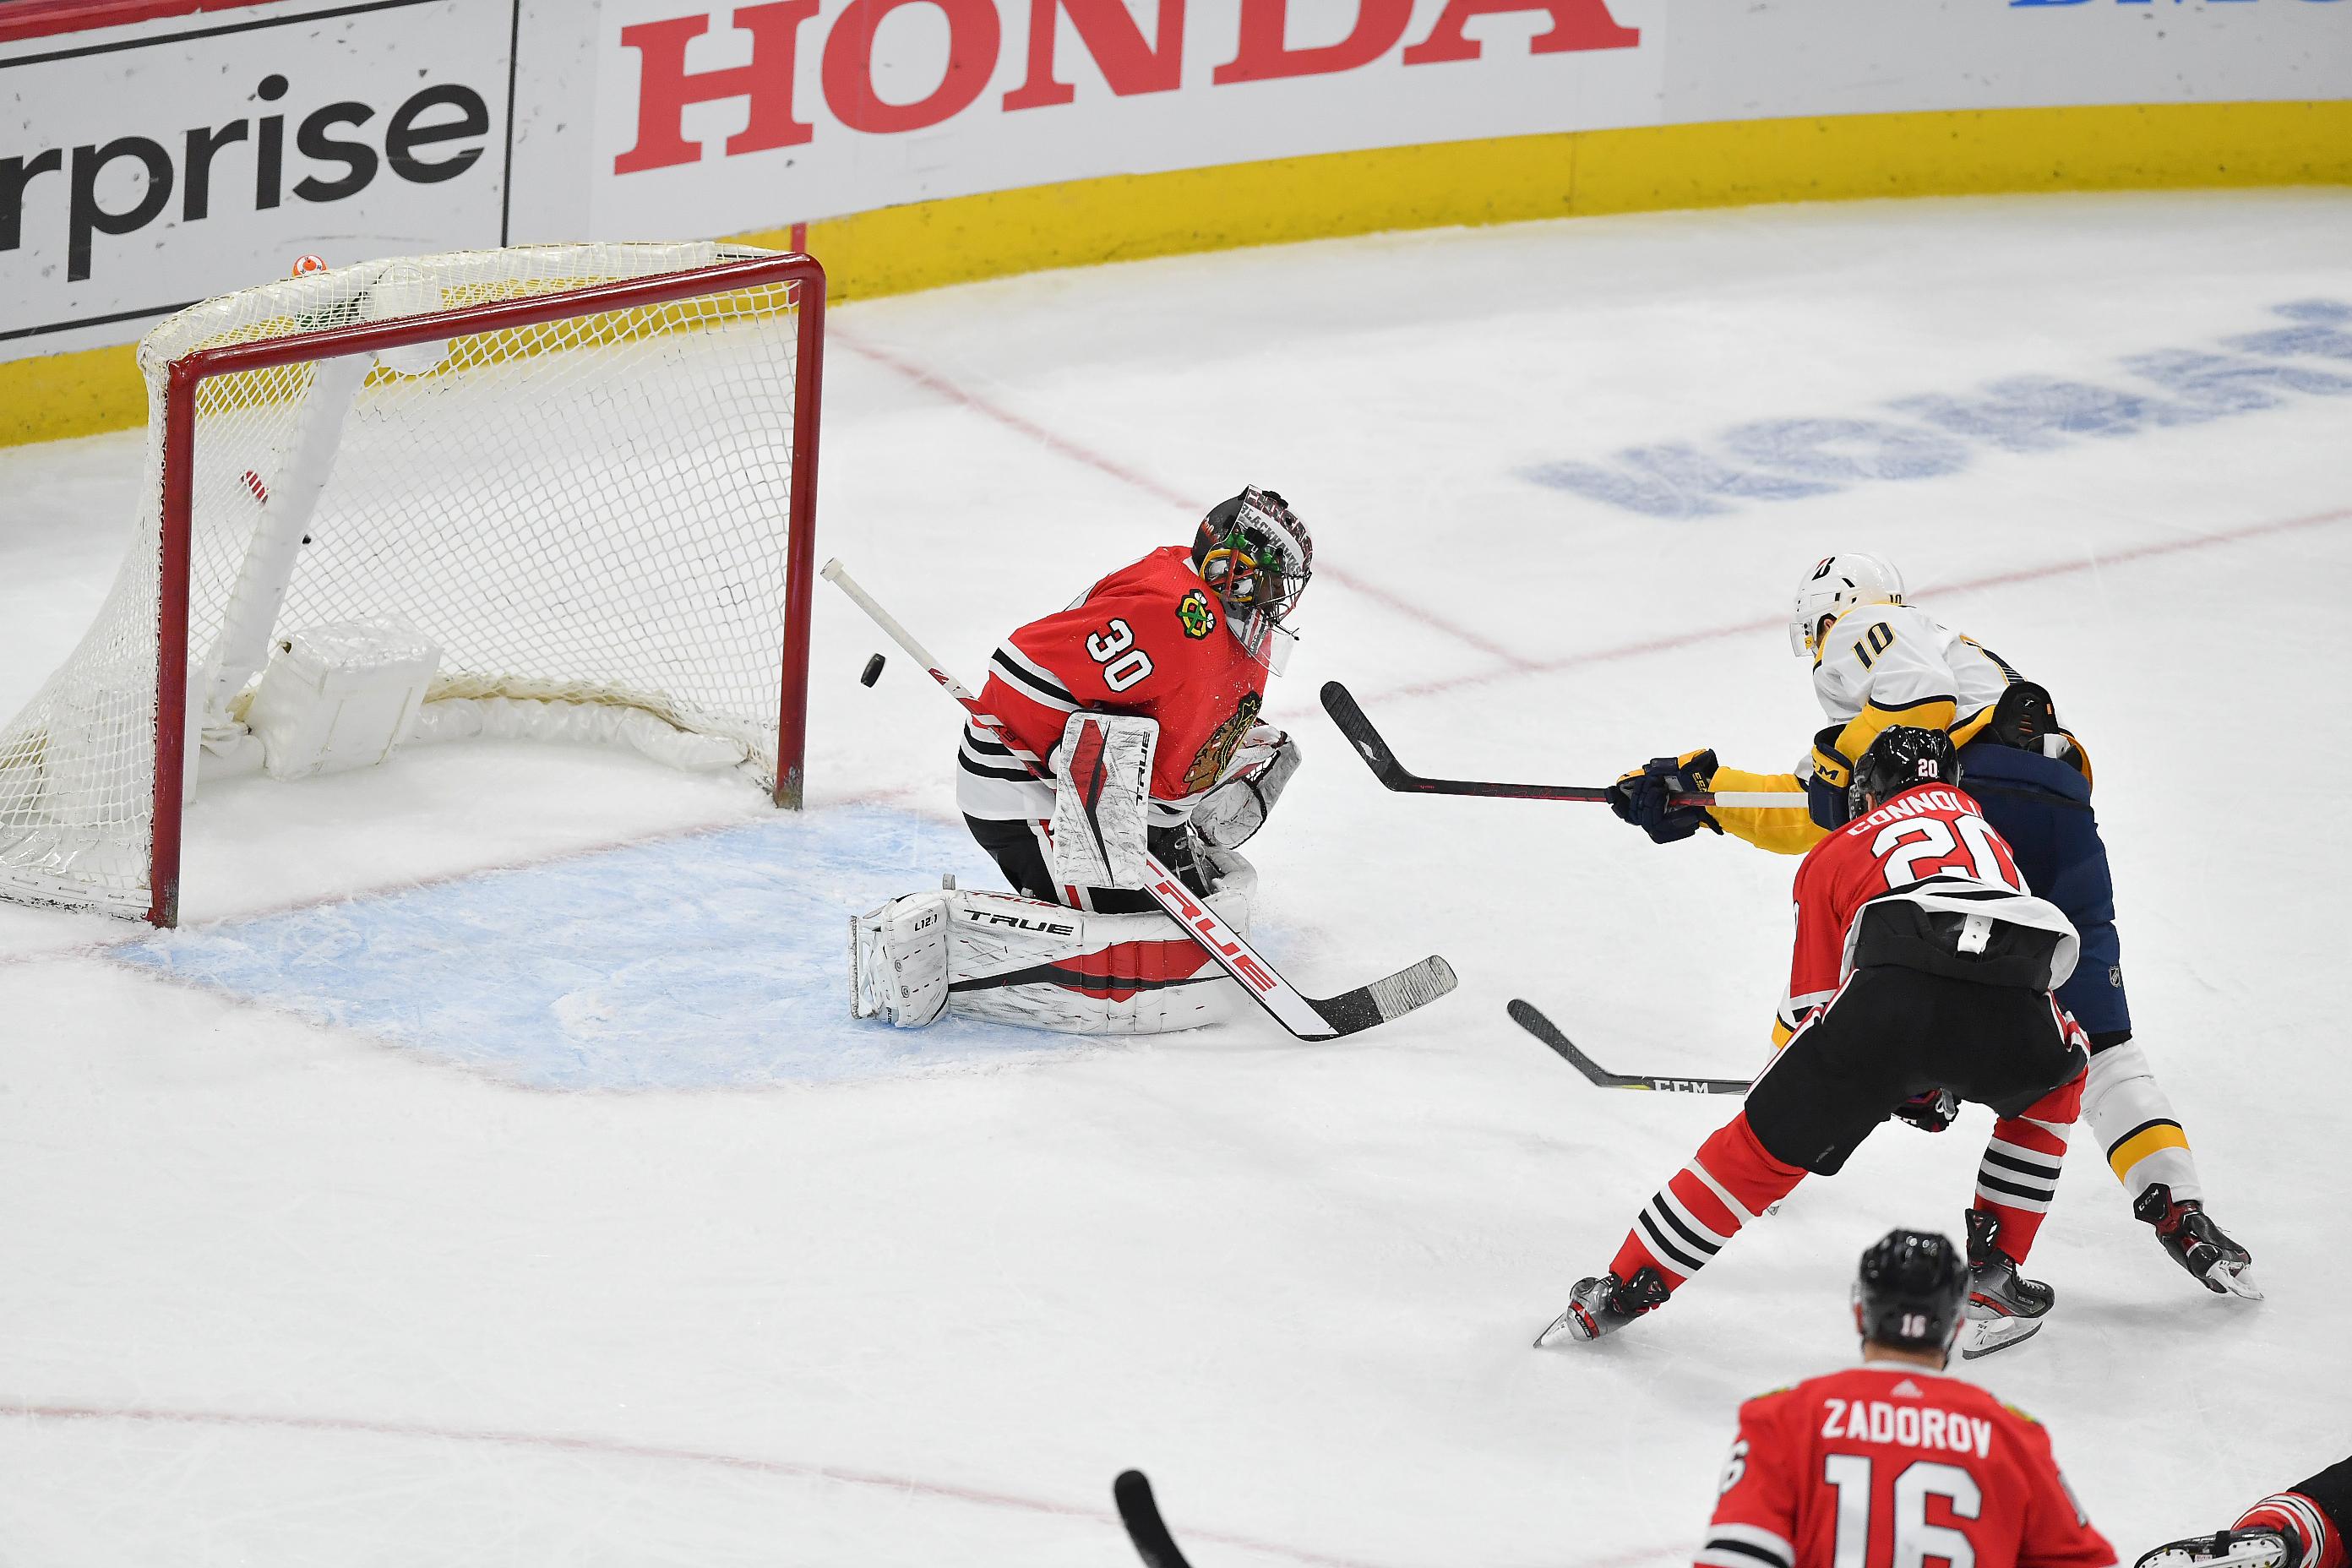 NHL: APR 21 Predators at Blackhawks